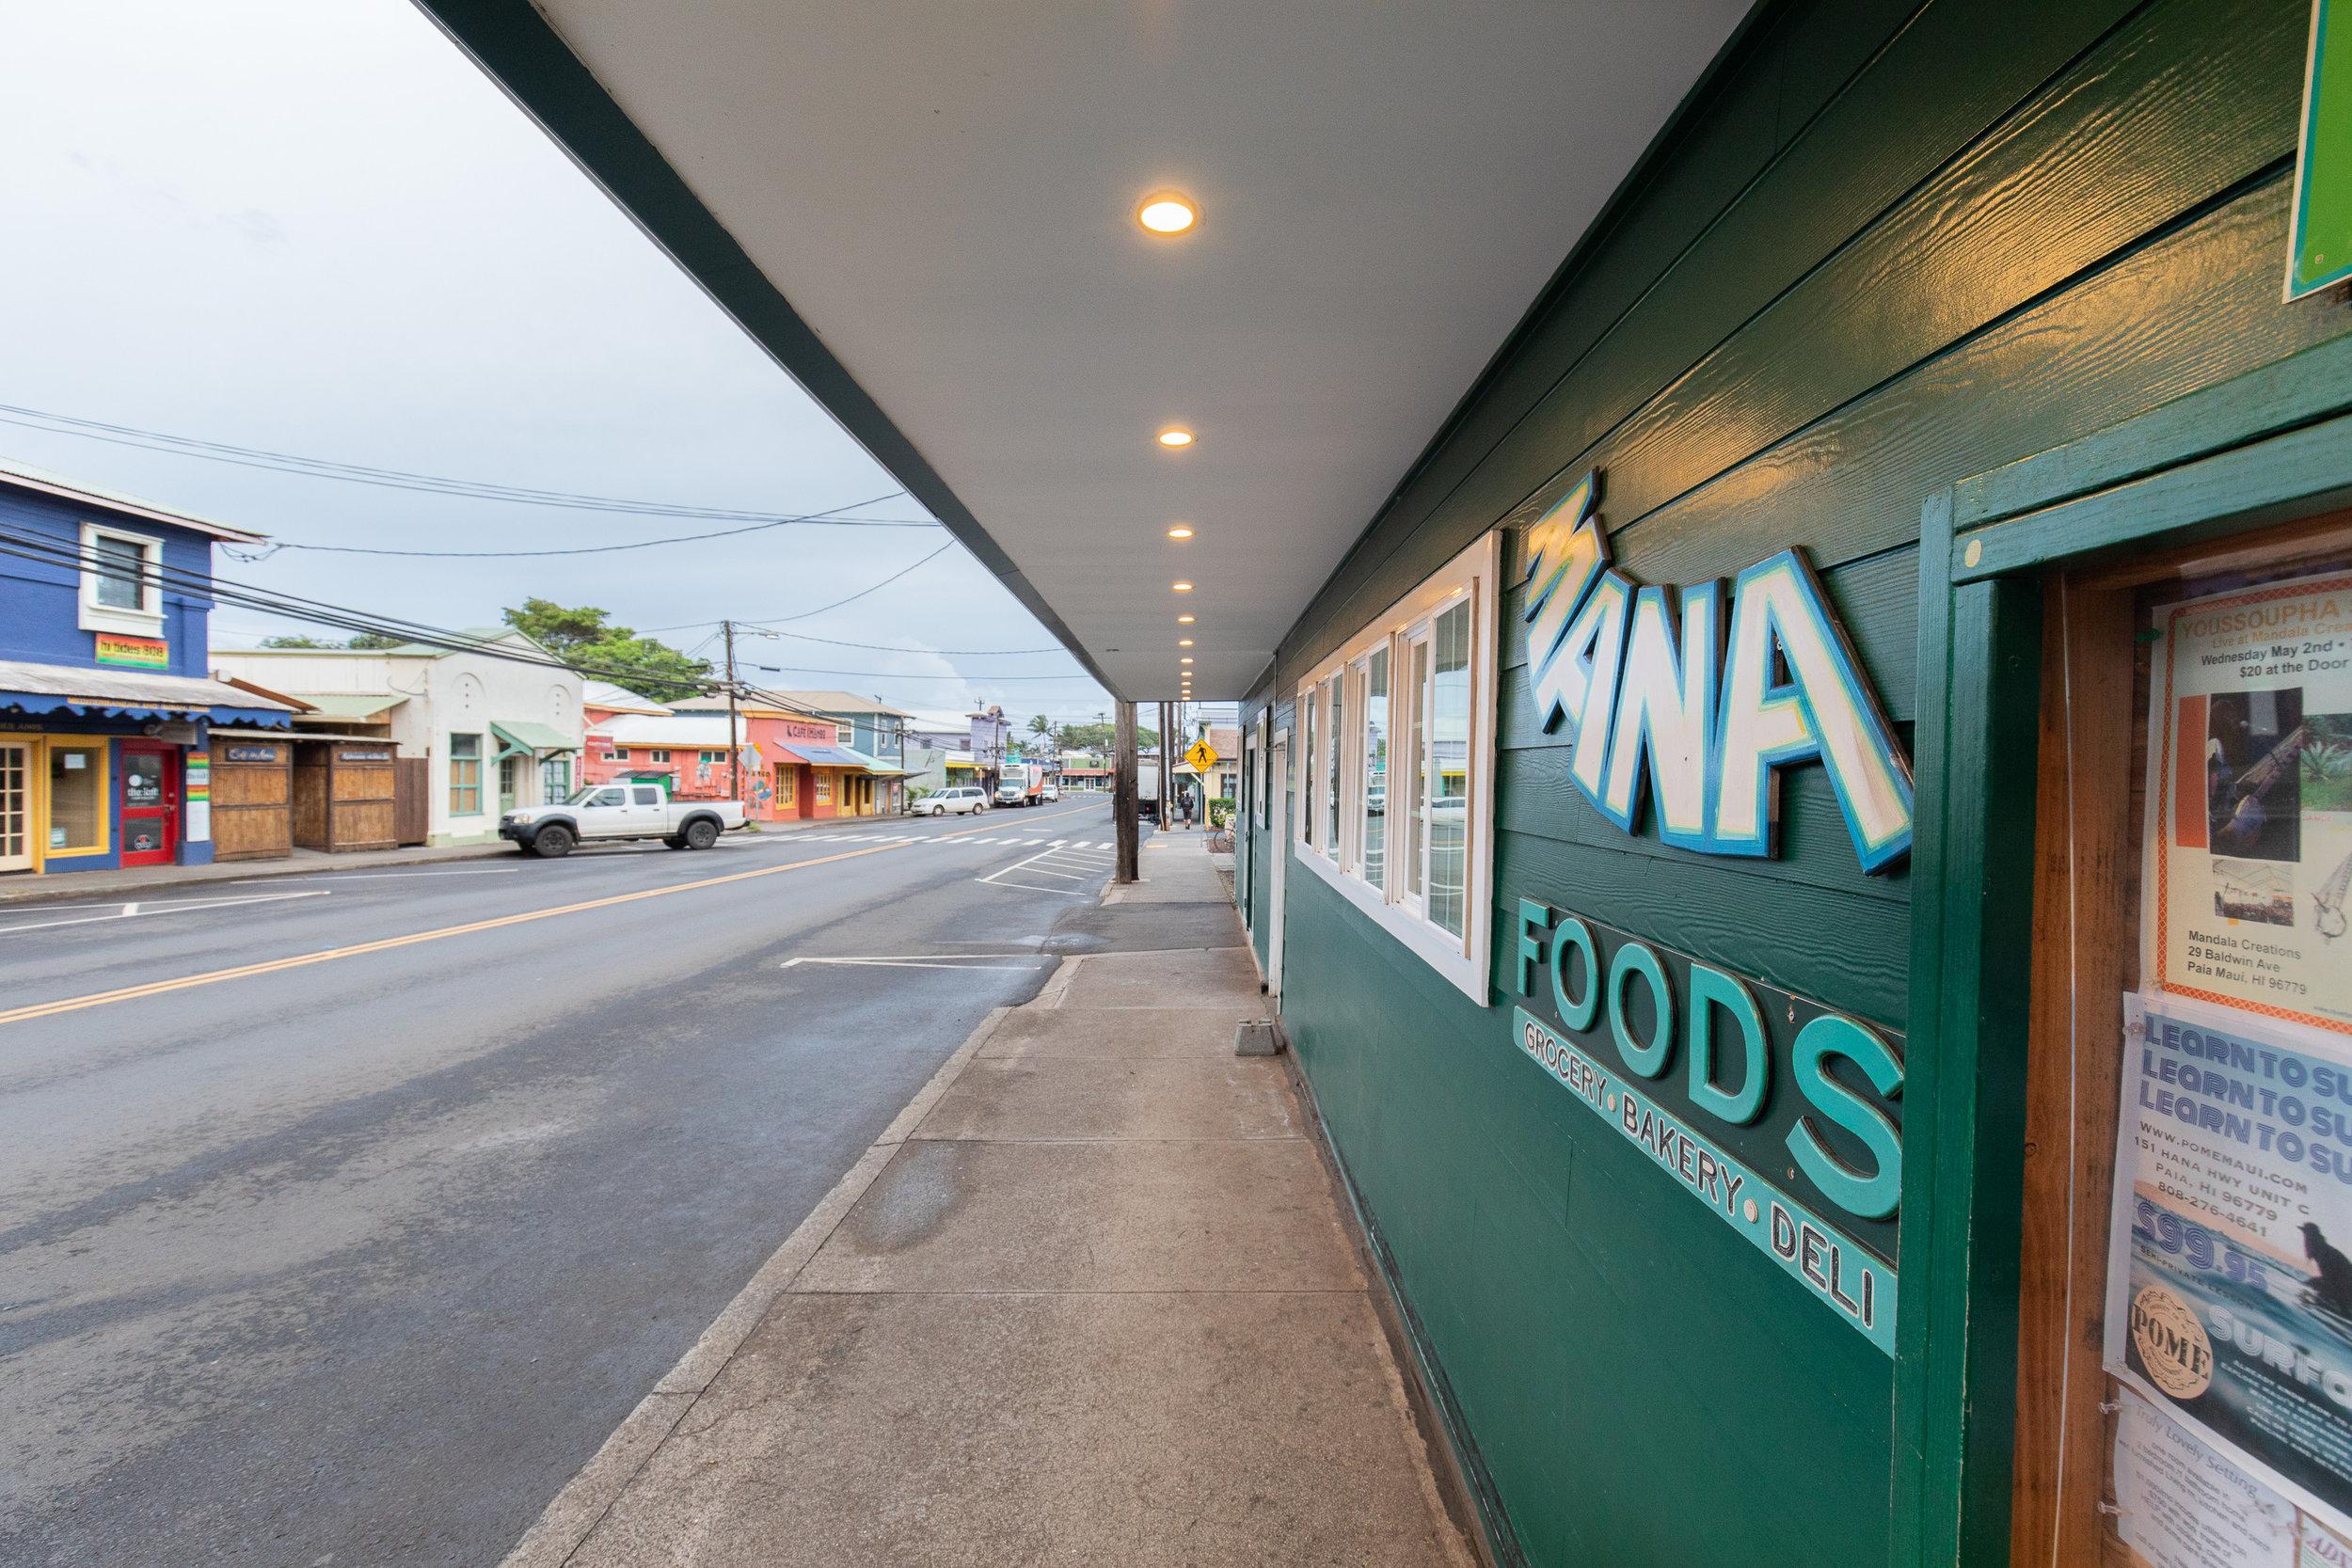 Mana-Foods-Store-Maui.JPG